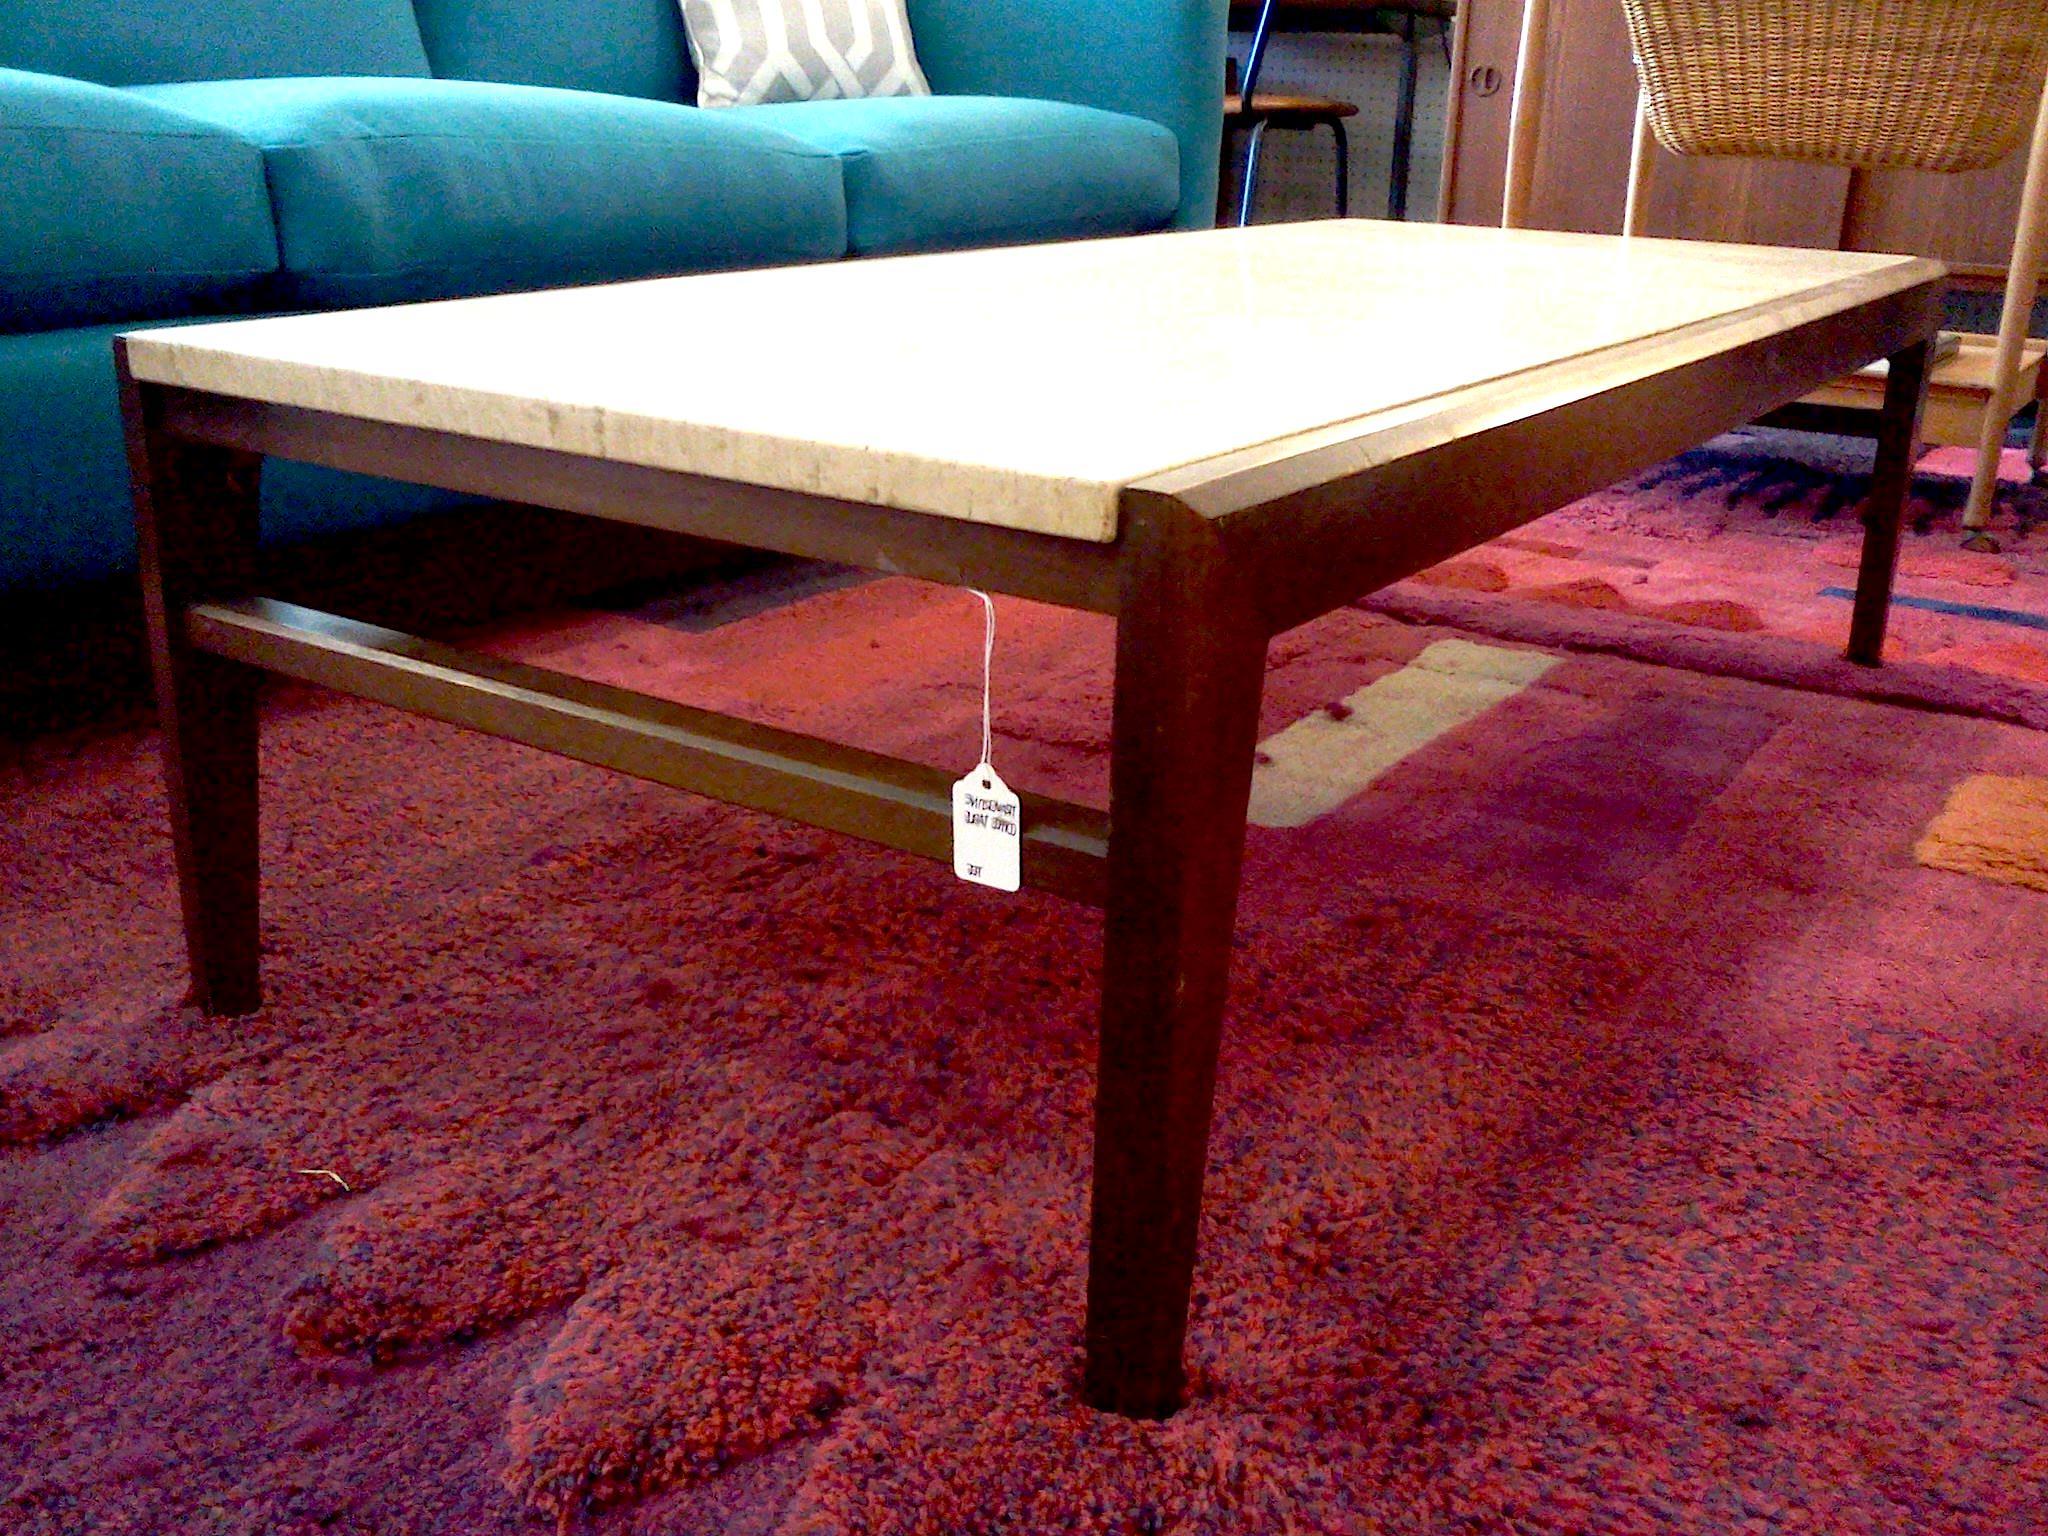 Contemporary Travertine Coffee Table Sushi Ichimura Decor Parsons Regarding Parsons Travertine Top & Elm Base 48x16 Console Tables (View 17 of 17)